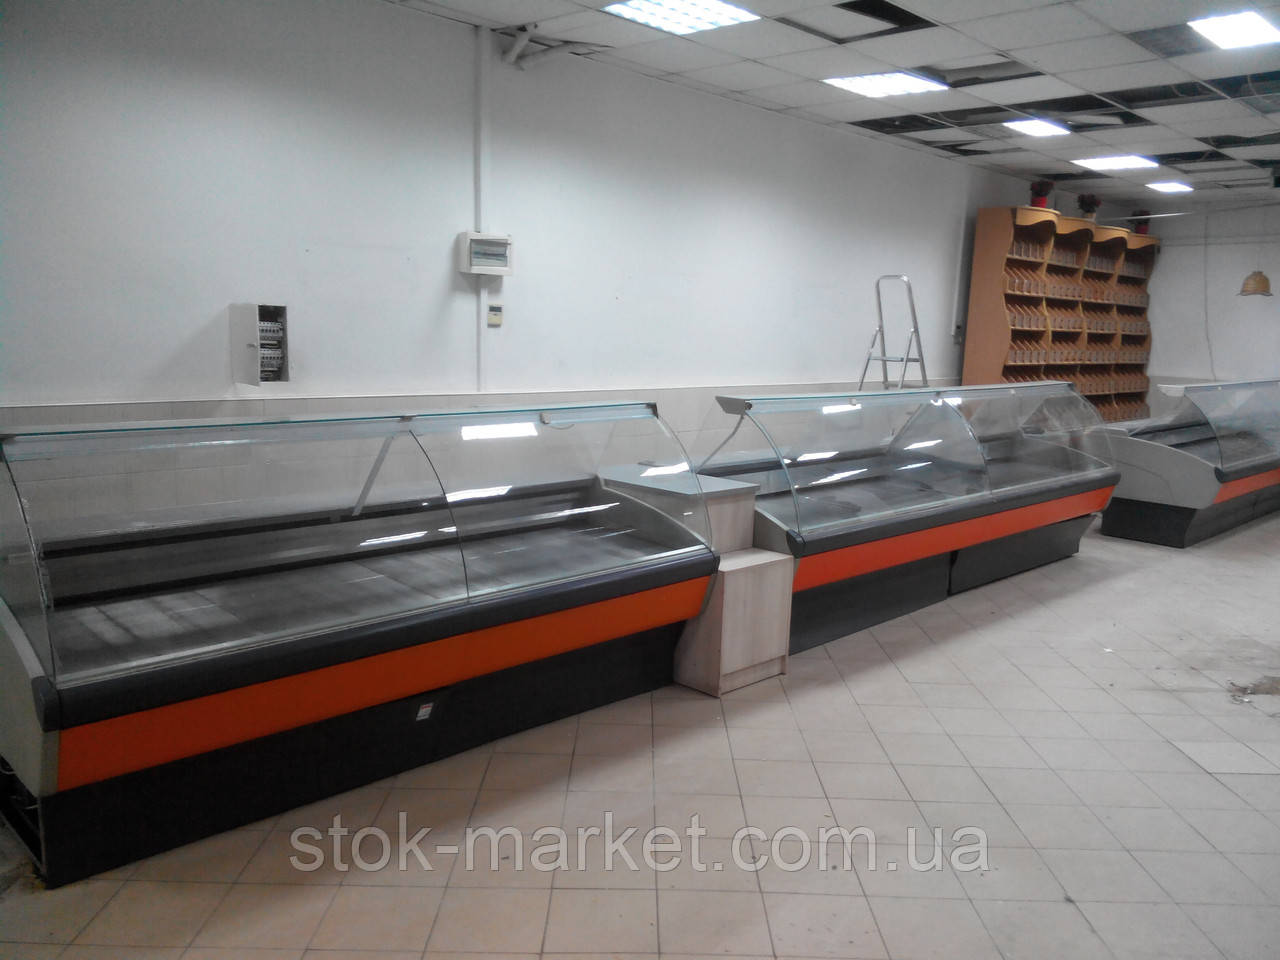 Холодильна вітрина Banco Astra Statico G. I. L.-385